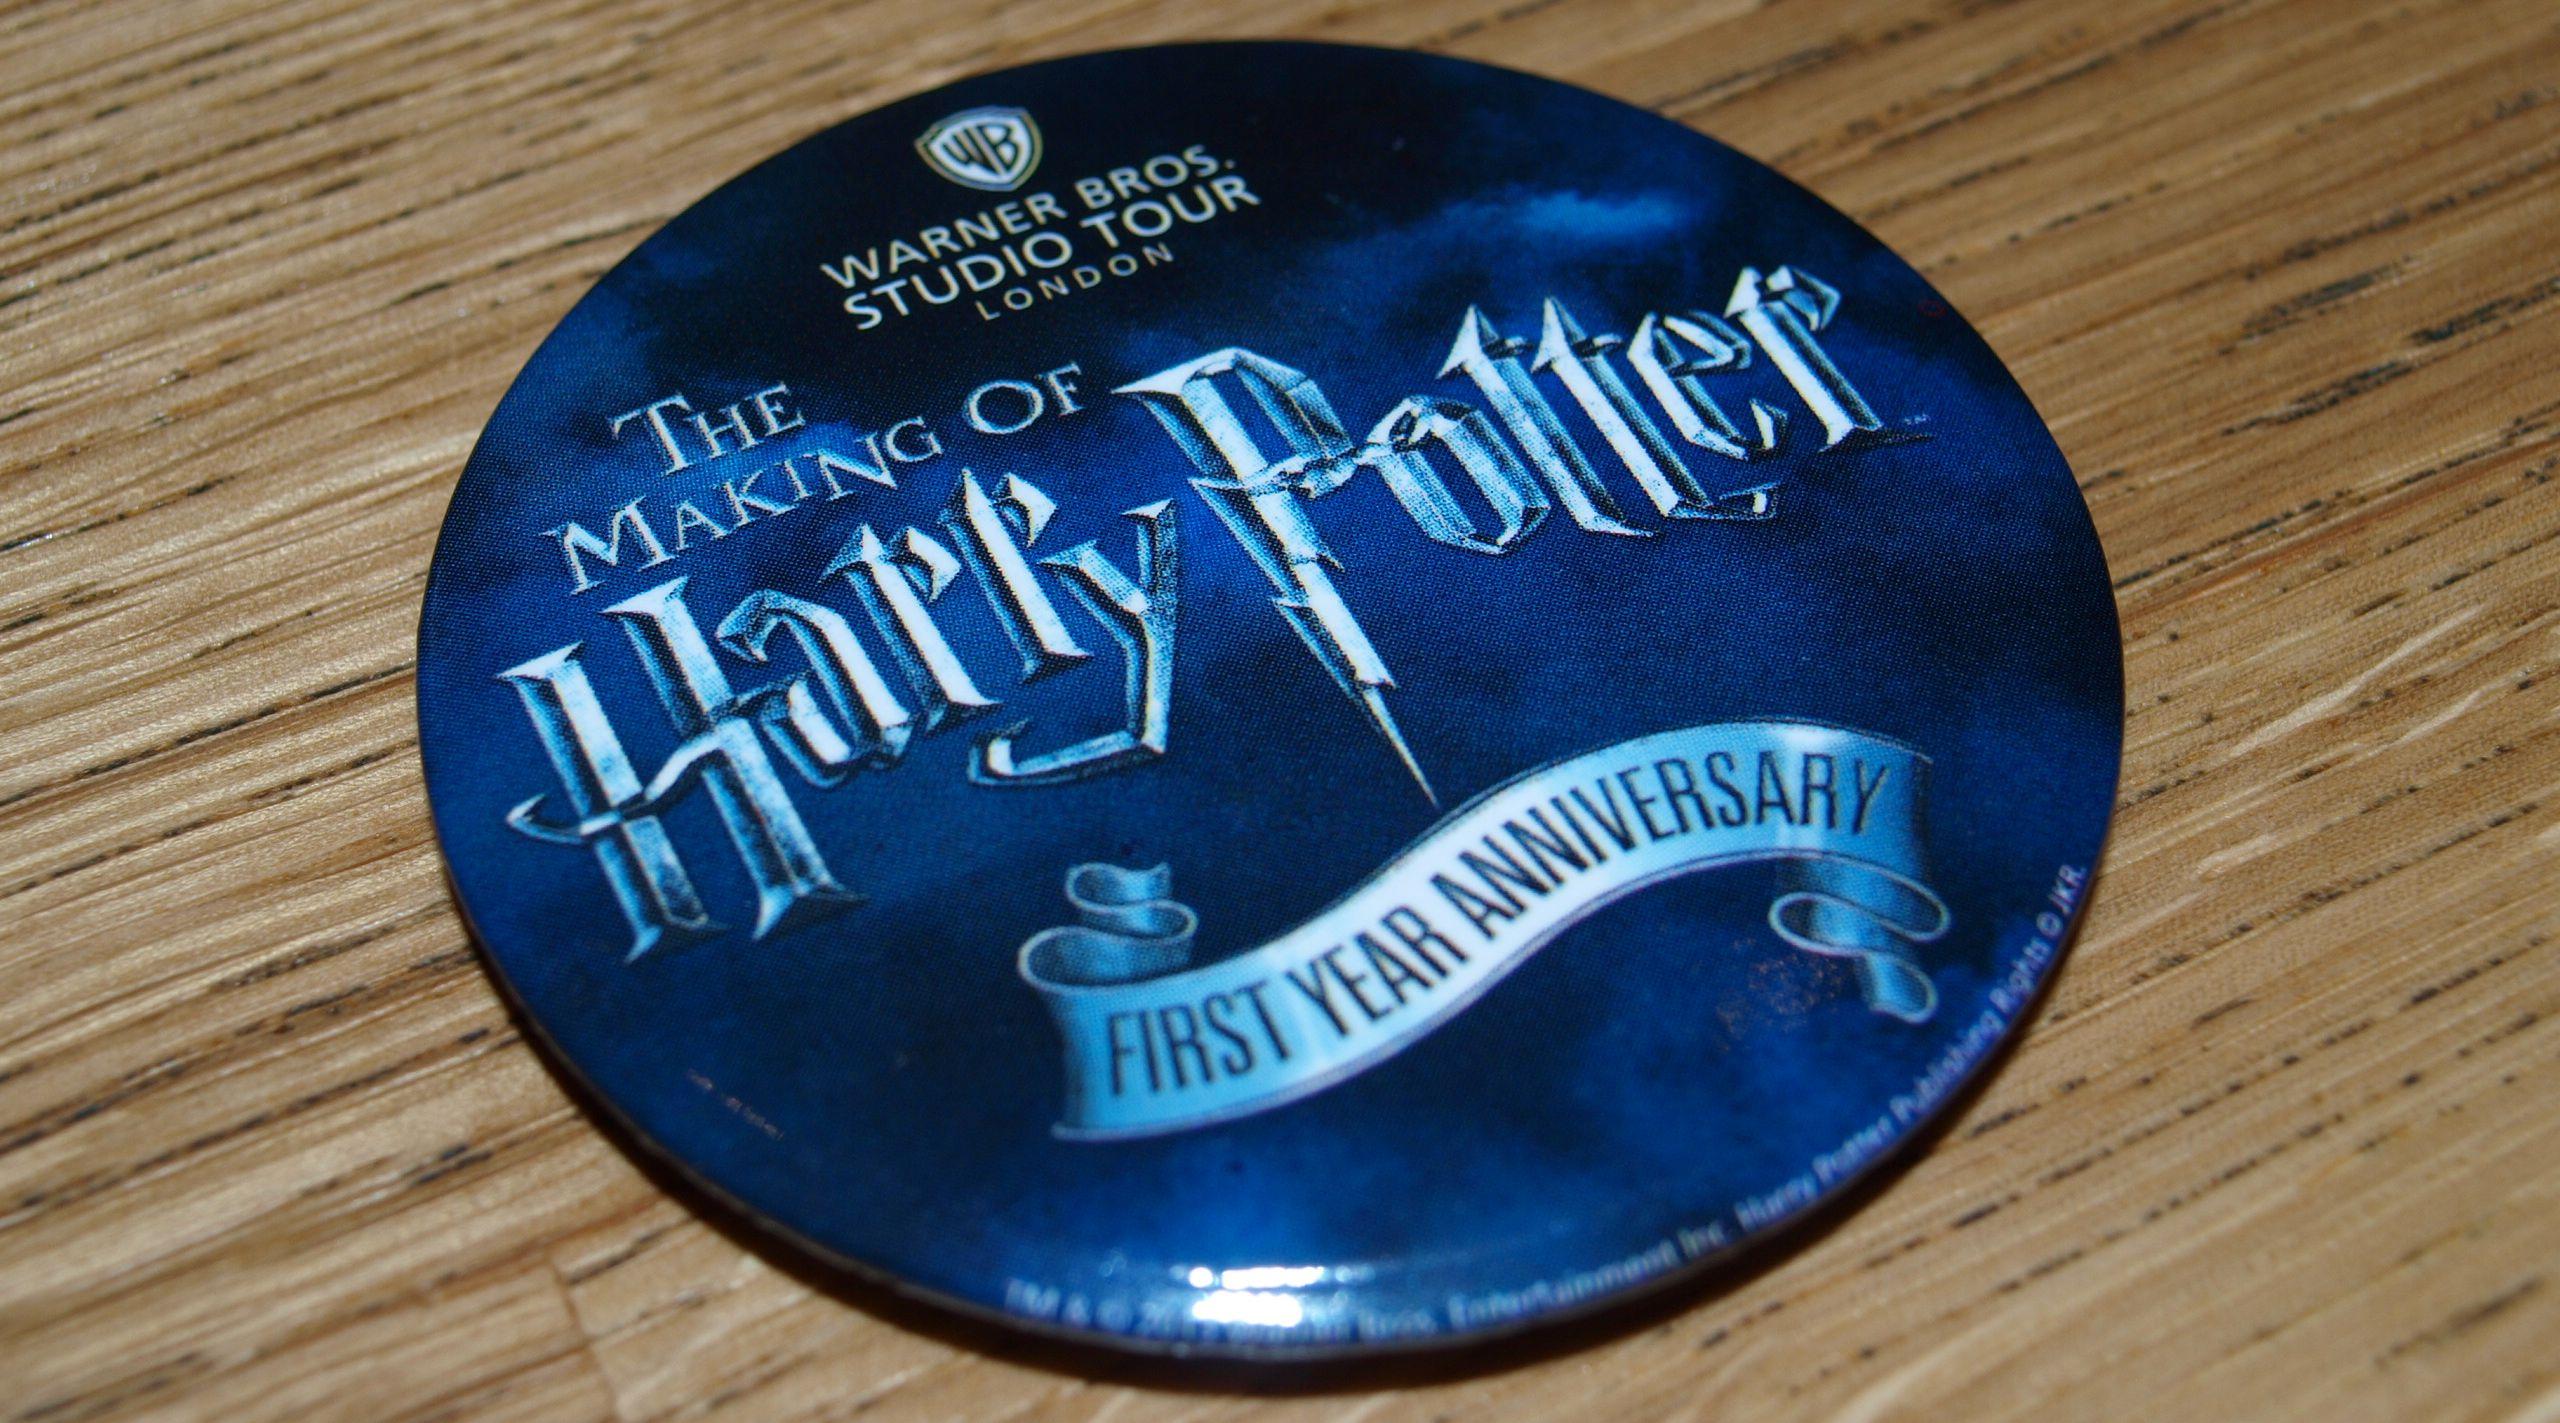 WB Studio Tour One Year Anniversary commemorative badge